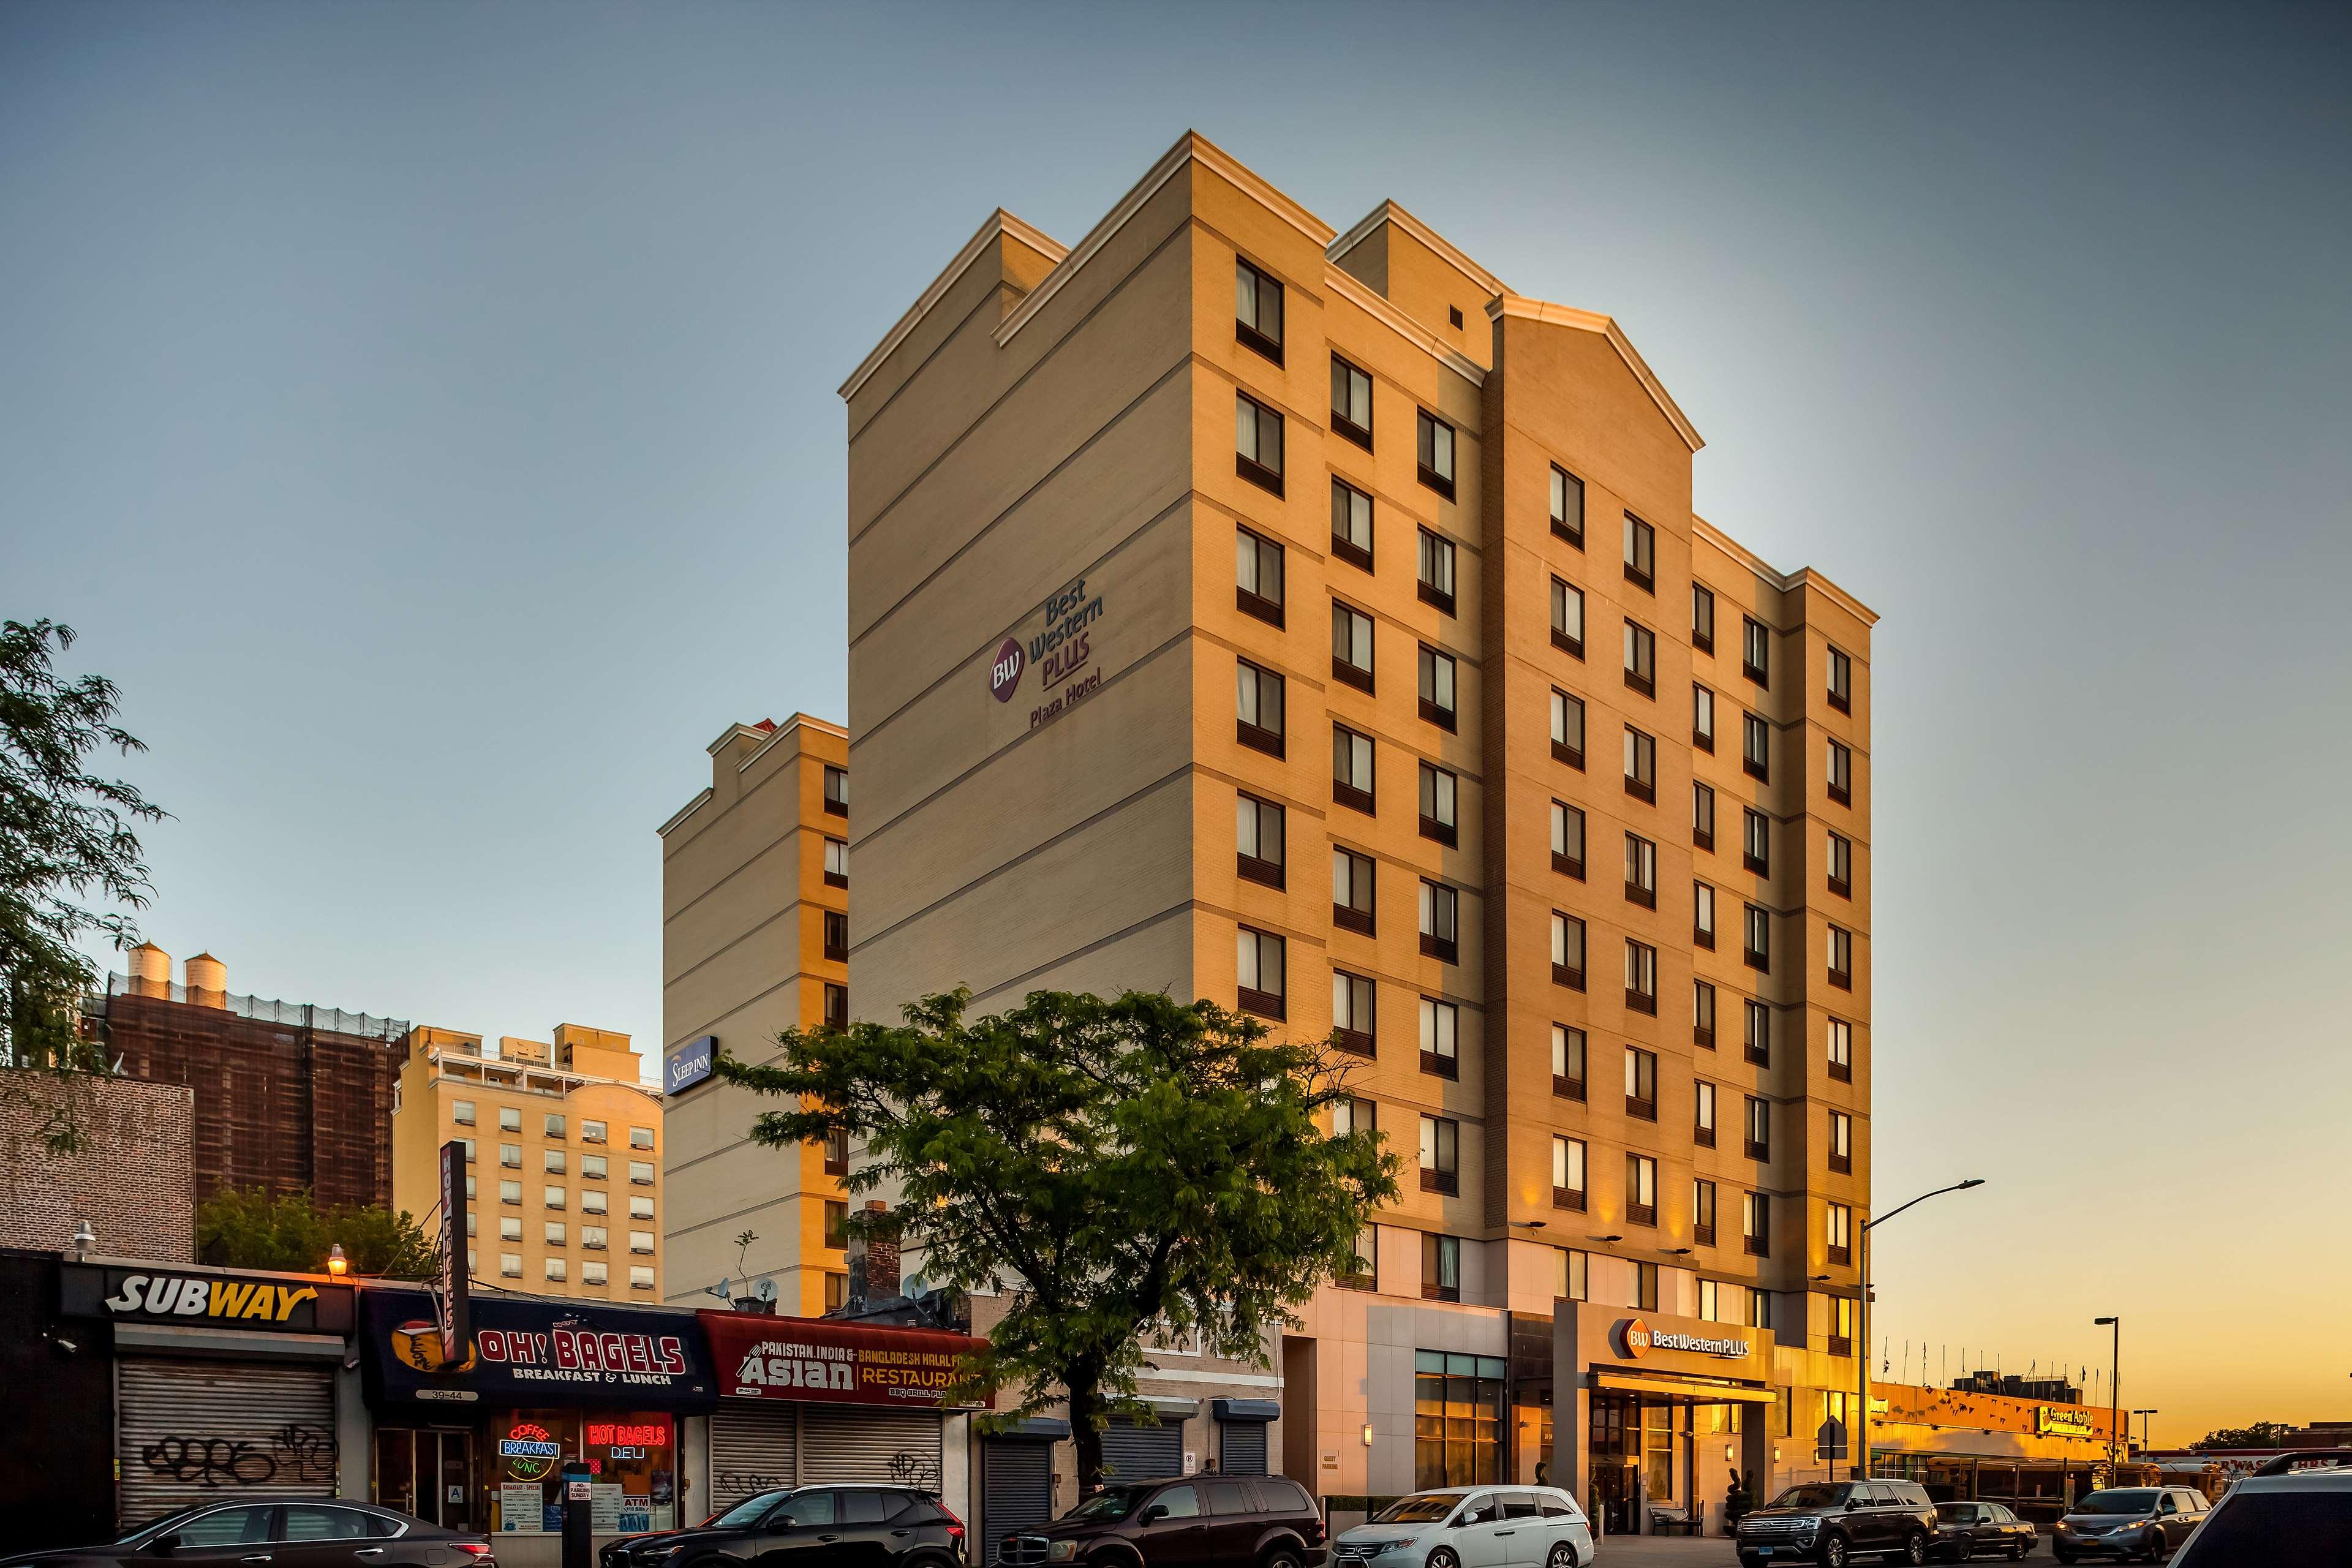 Best Western Plus Plaza Hotel image 0